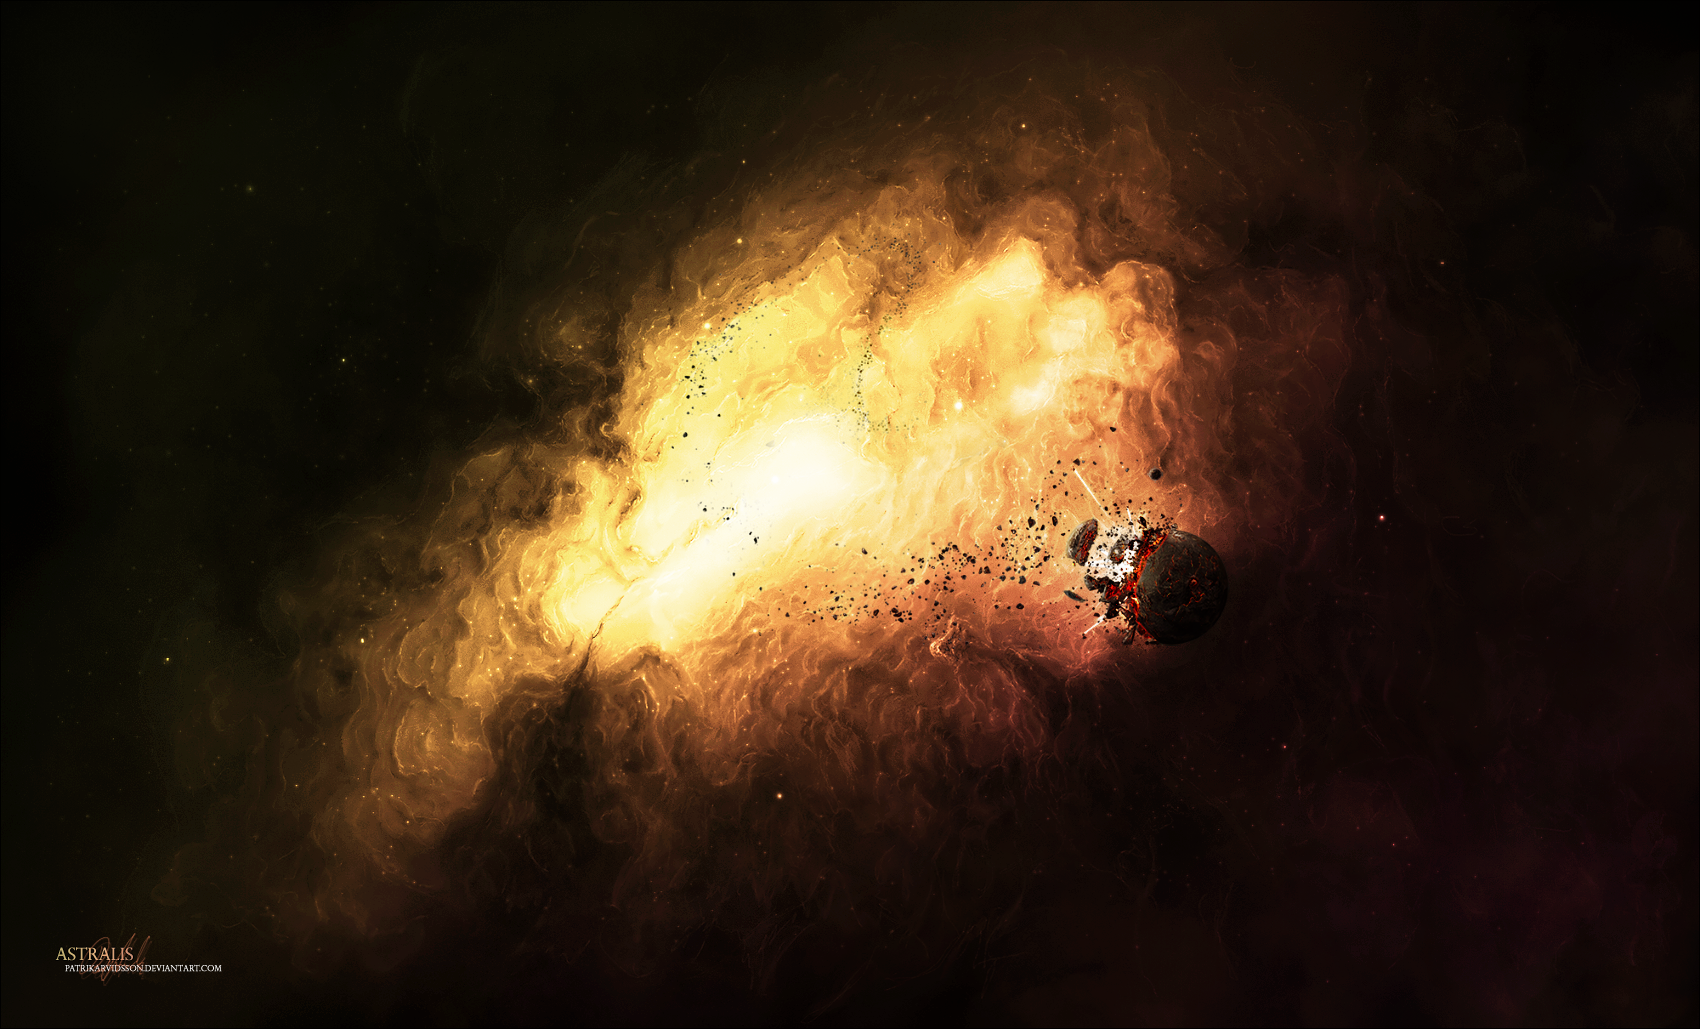 Astralis by patrikarvidsson